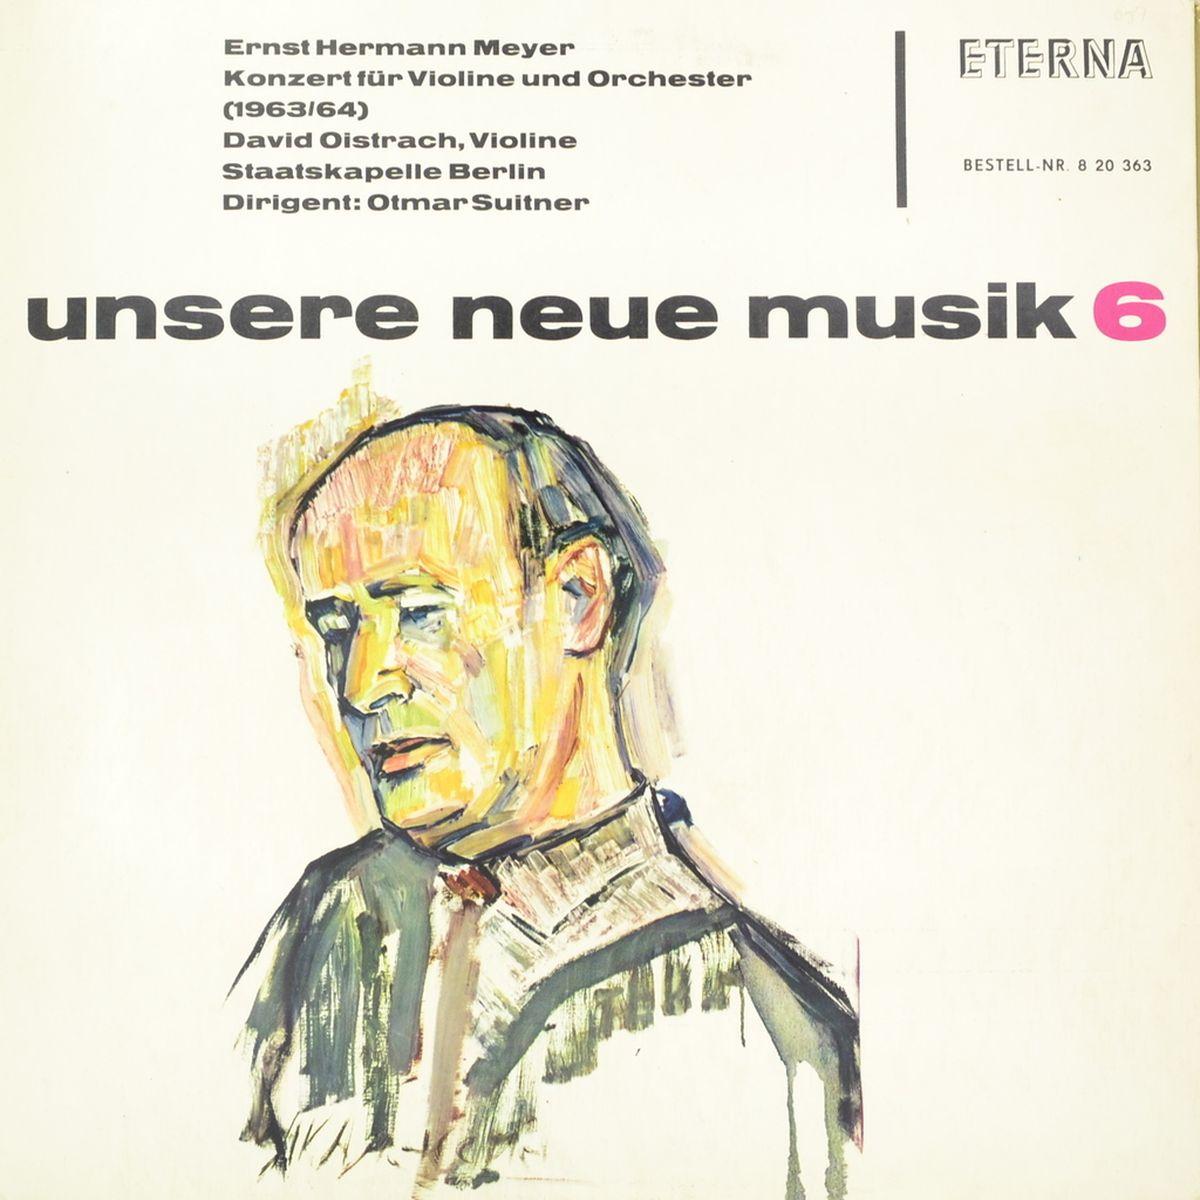 Ernst Hermann Meyer - David Oistrach, Staatskapelle Berlin, Otmar Suitner – Konzert Fur Violine Und Orchester (LP) недорго, оригинальная цена